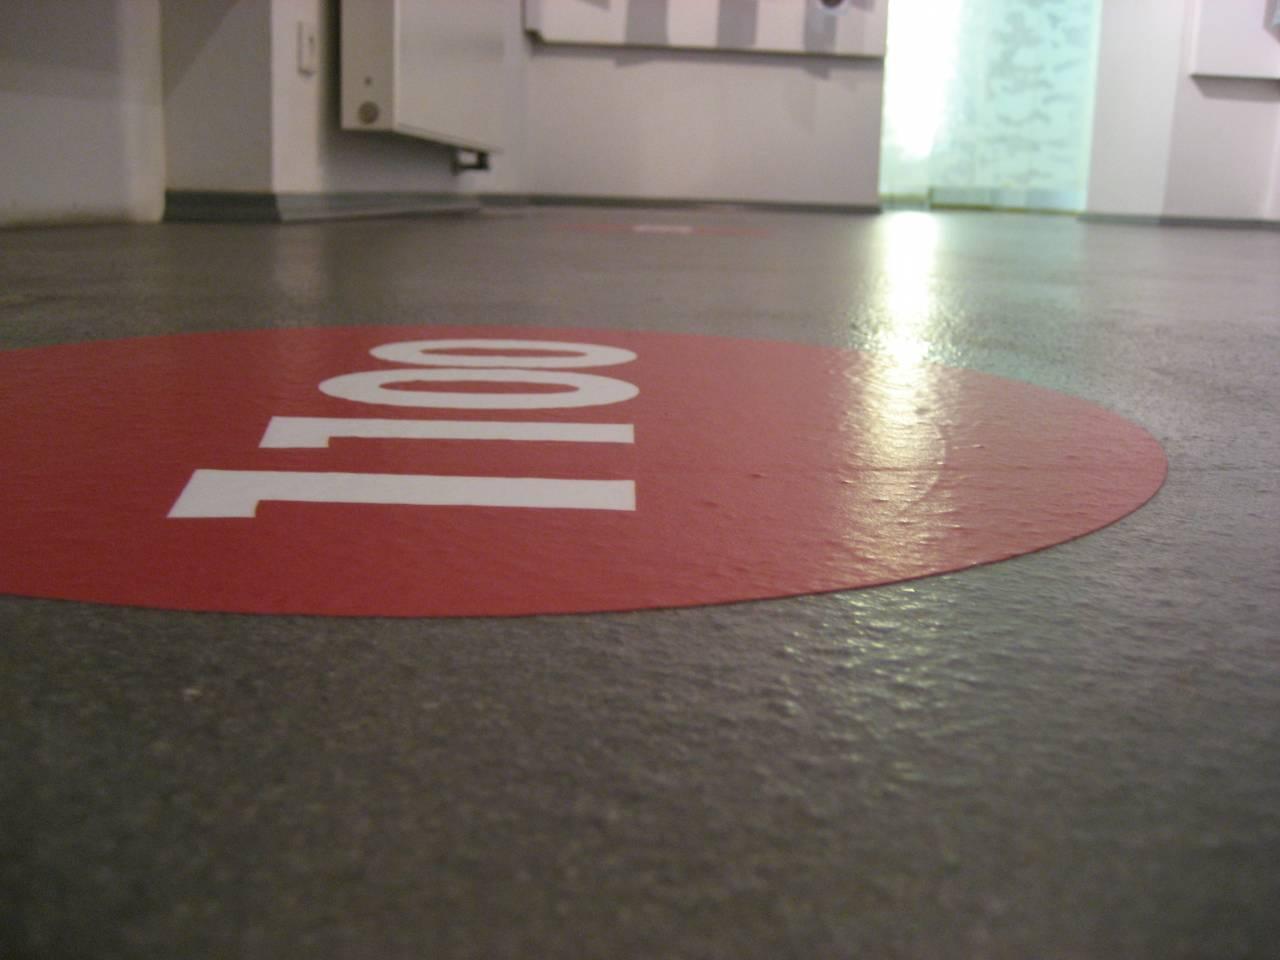 Fußbodenfolien/ -laminat